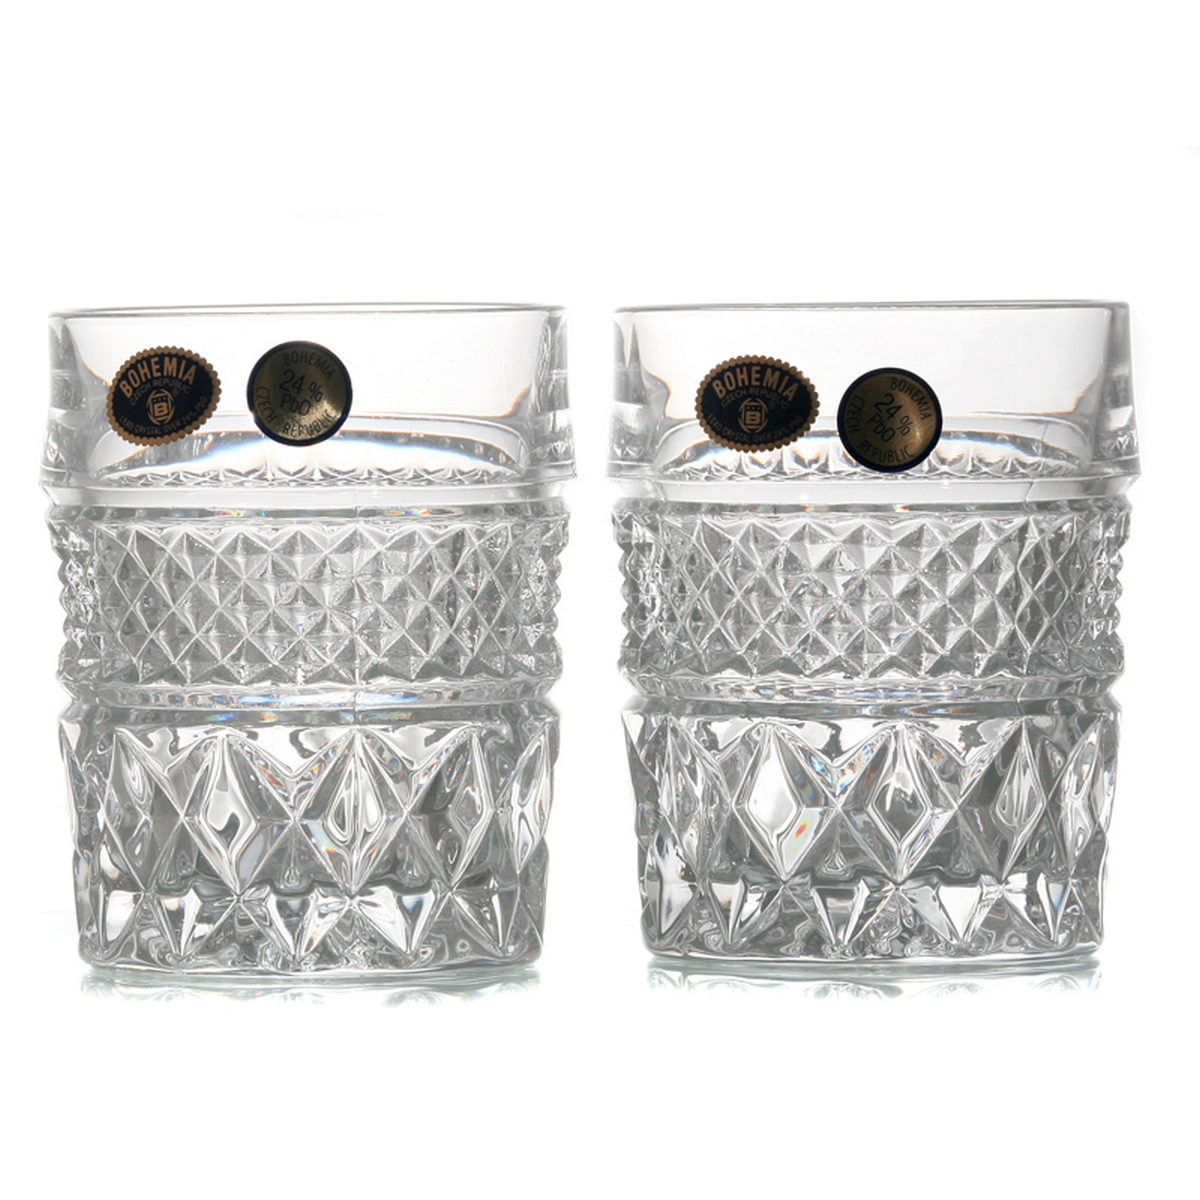 Madison Set 6 Pahare Cristal Bohemia Whisky 240 Ml 2021 aranjareamesei.ro